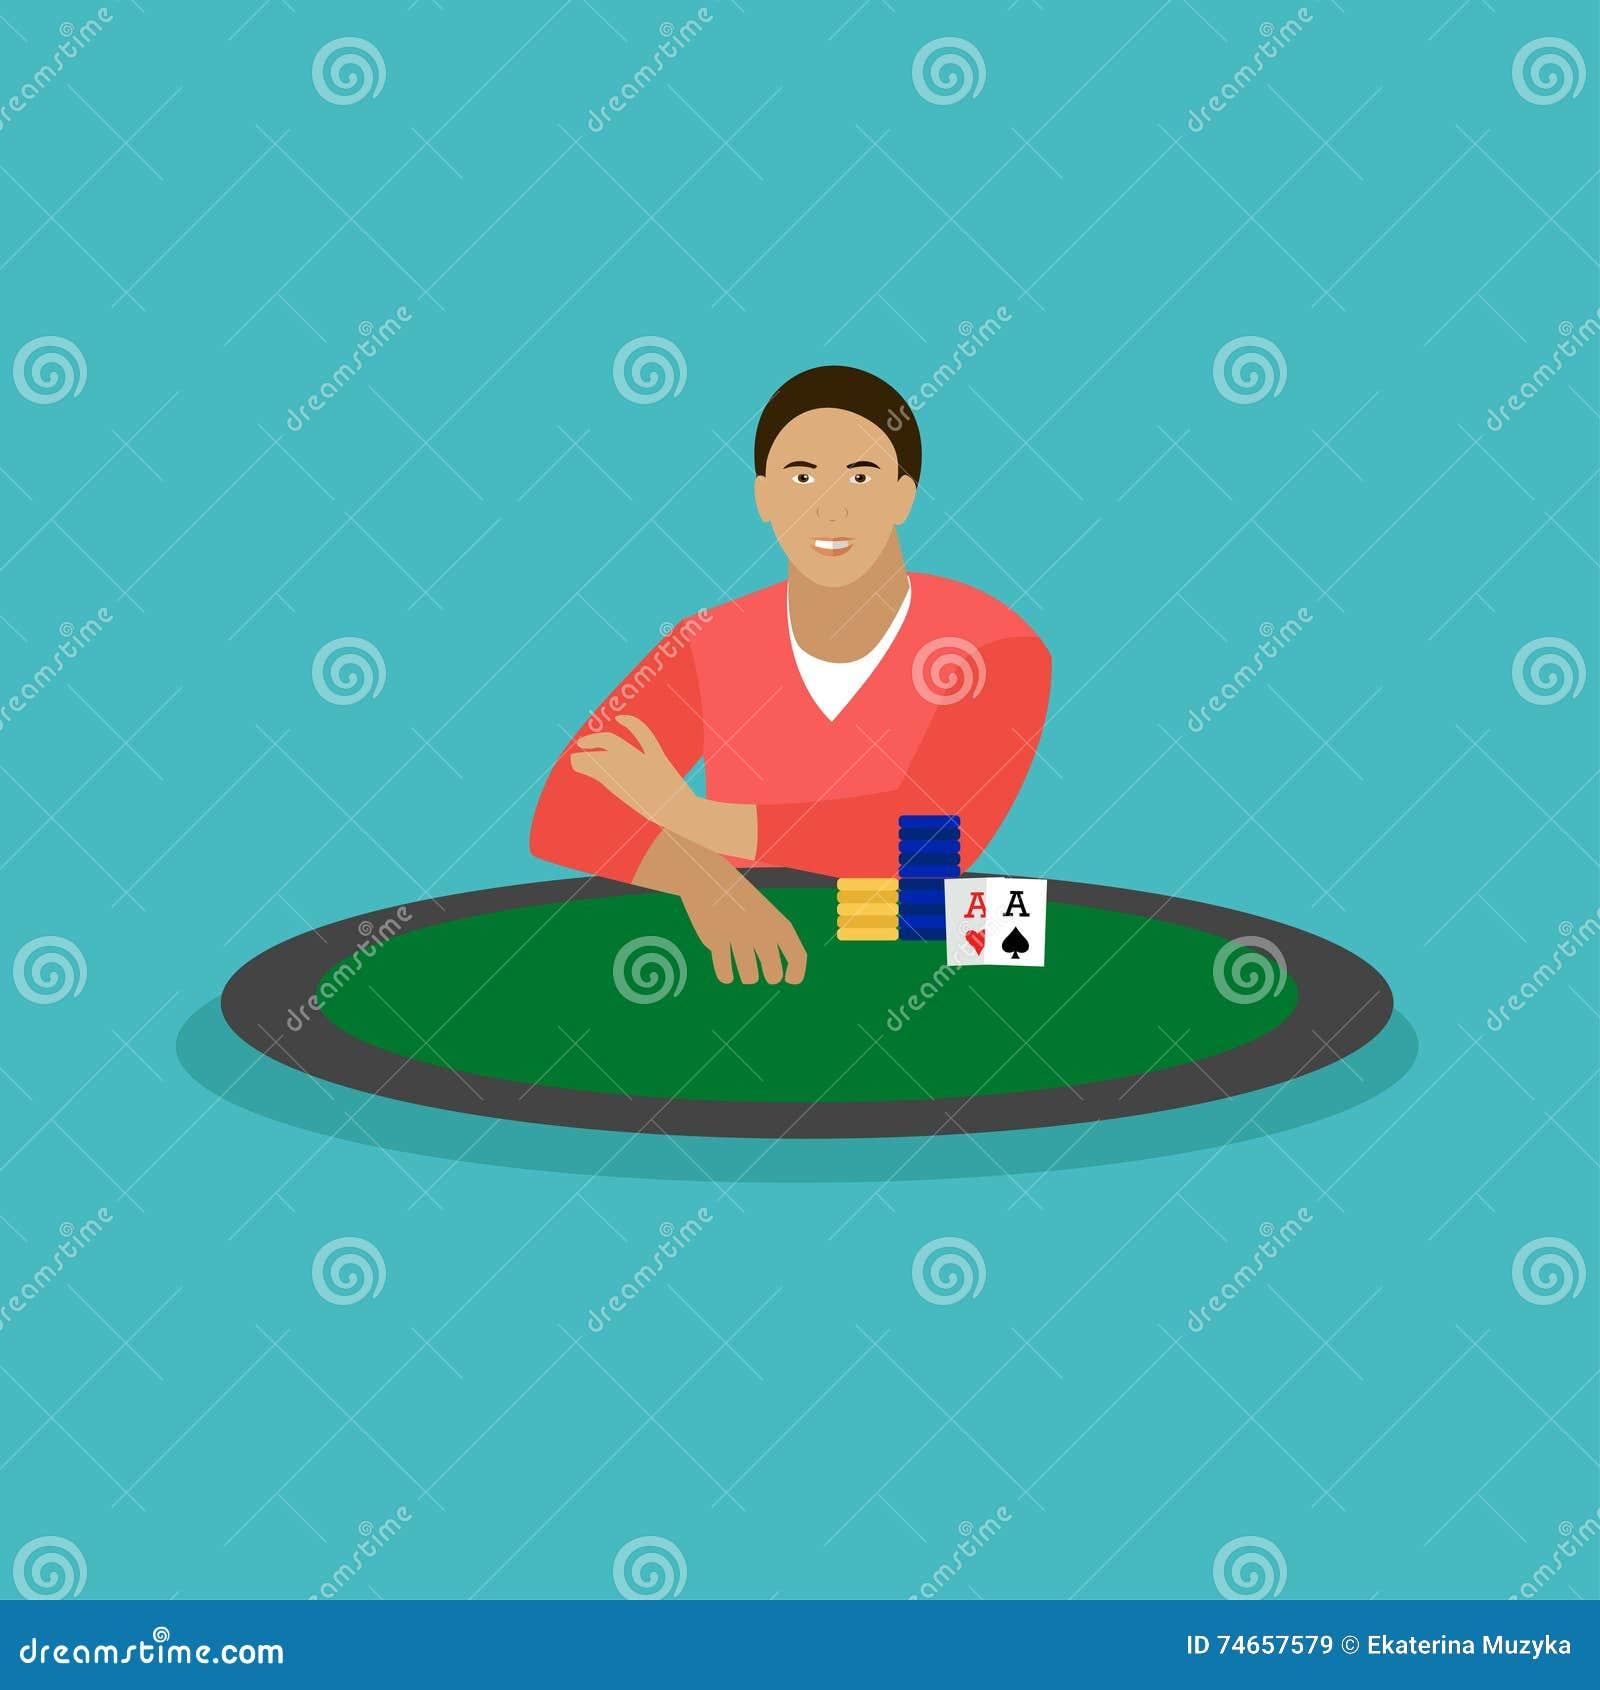 online gambling casino game onlin